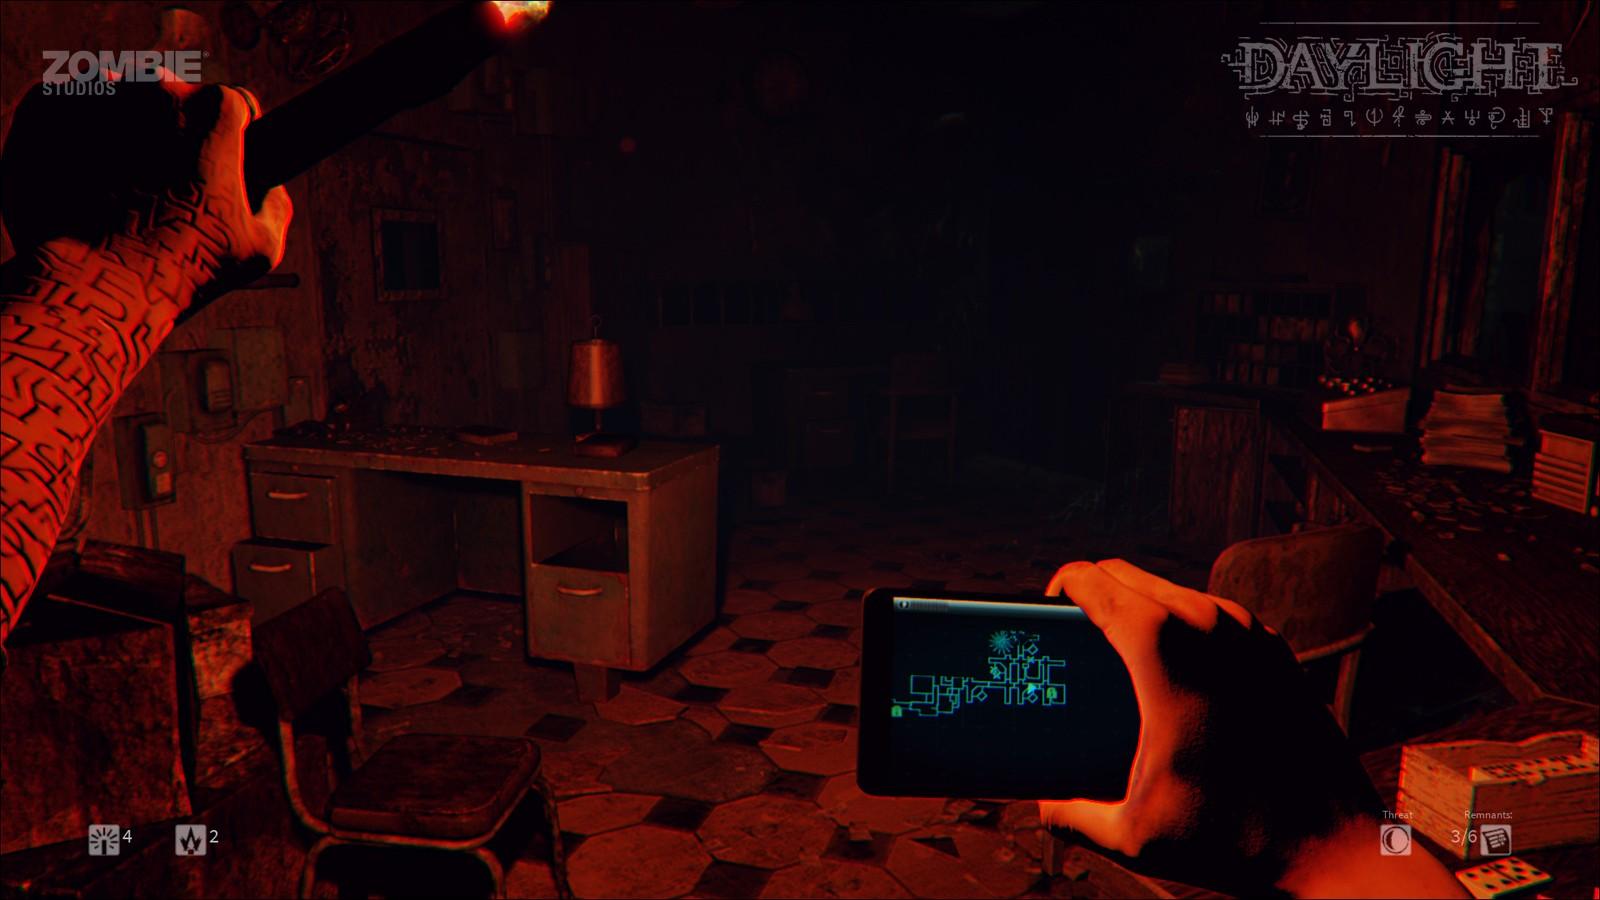 Daylight llegará a PS4 el día 8 de Abril A5hq